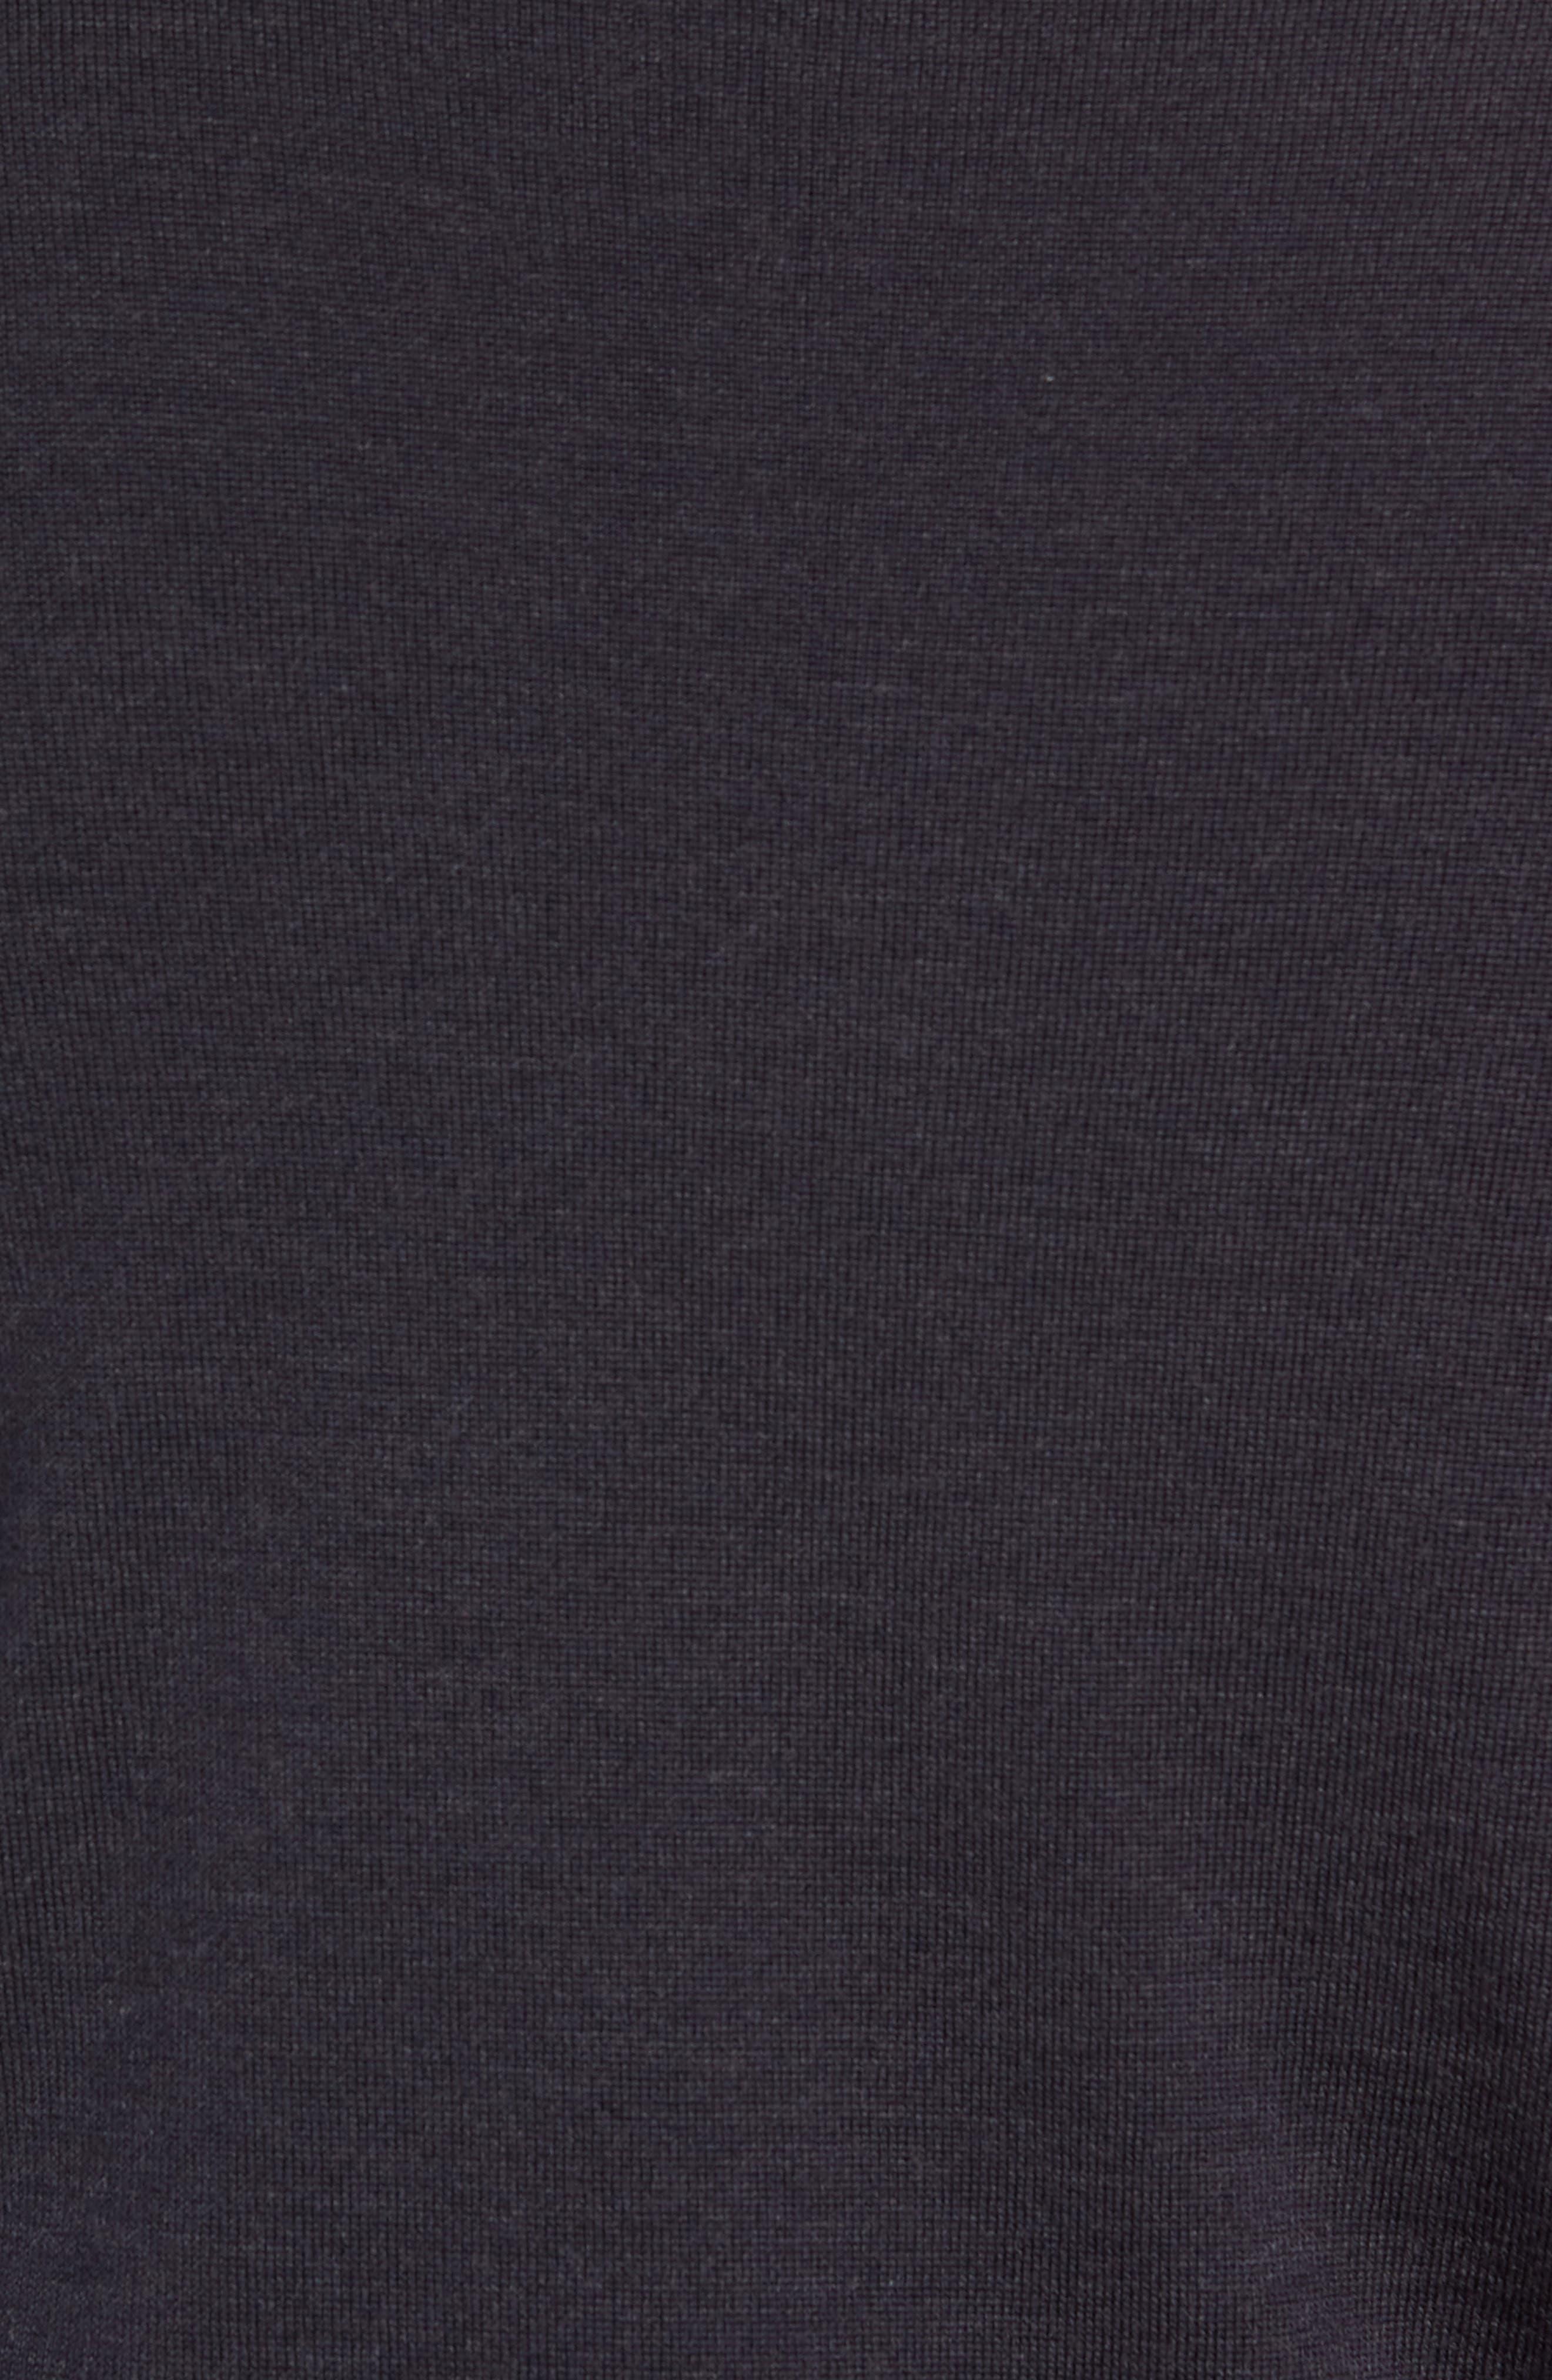 Claygate Slim Fit Merino Wool Zip Jacket,                             Alternate thumbnail 5, color,                             HEPBURN SMOKE